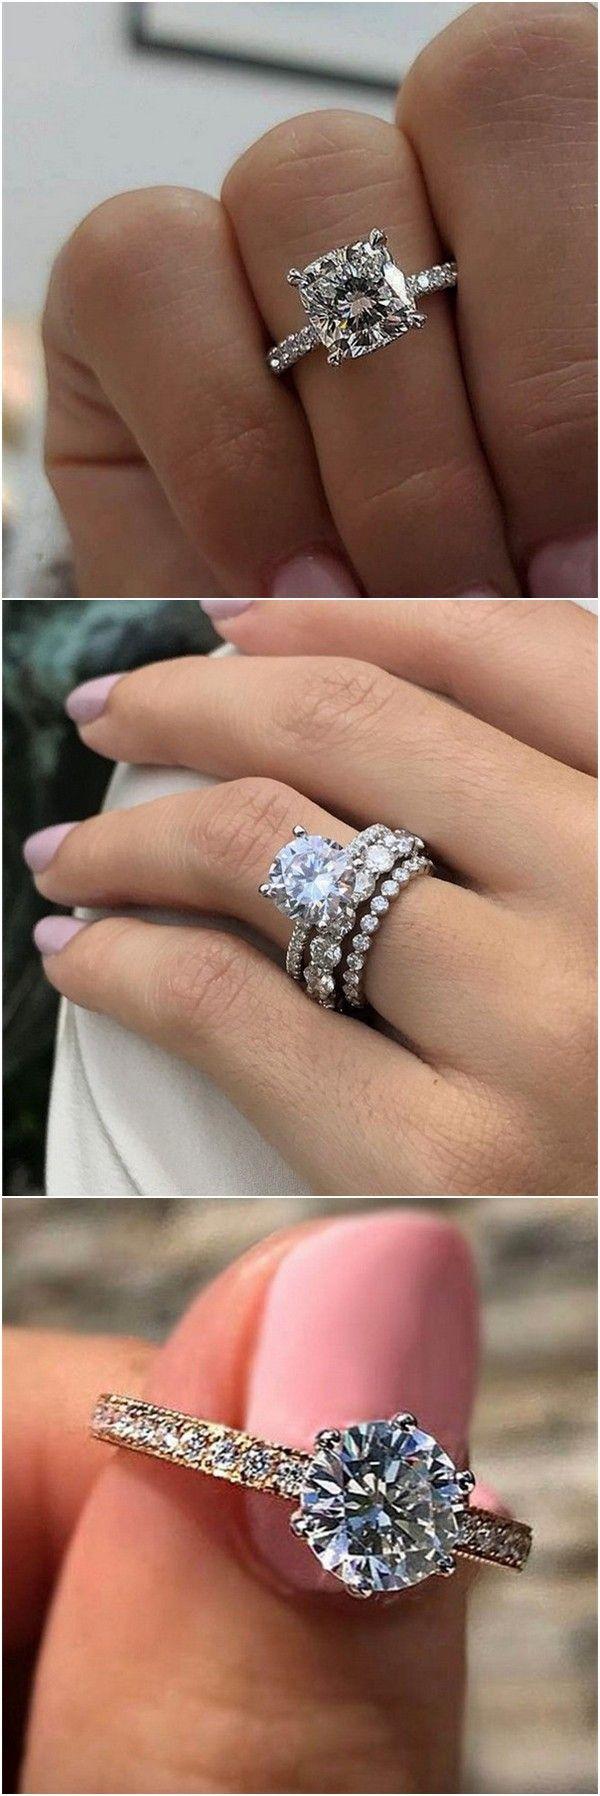 10 Breathtaking Wedding Engagement Rings For 2018 Wedding Ideas